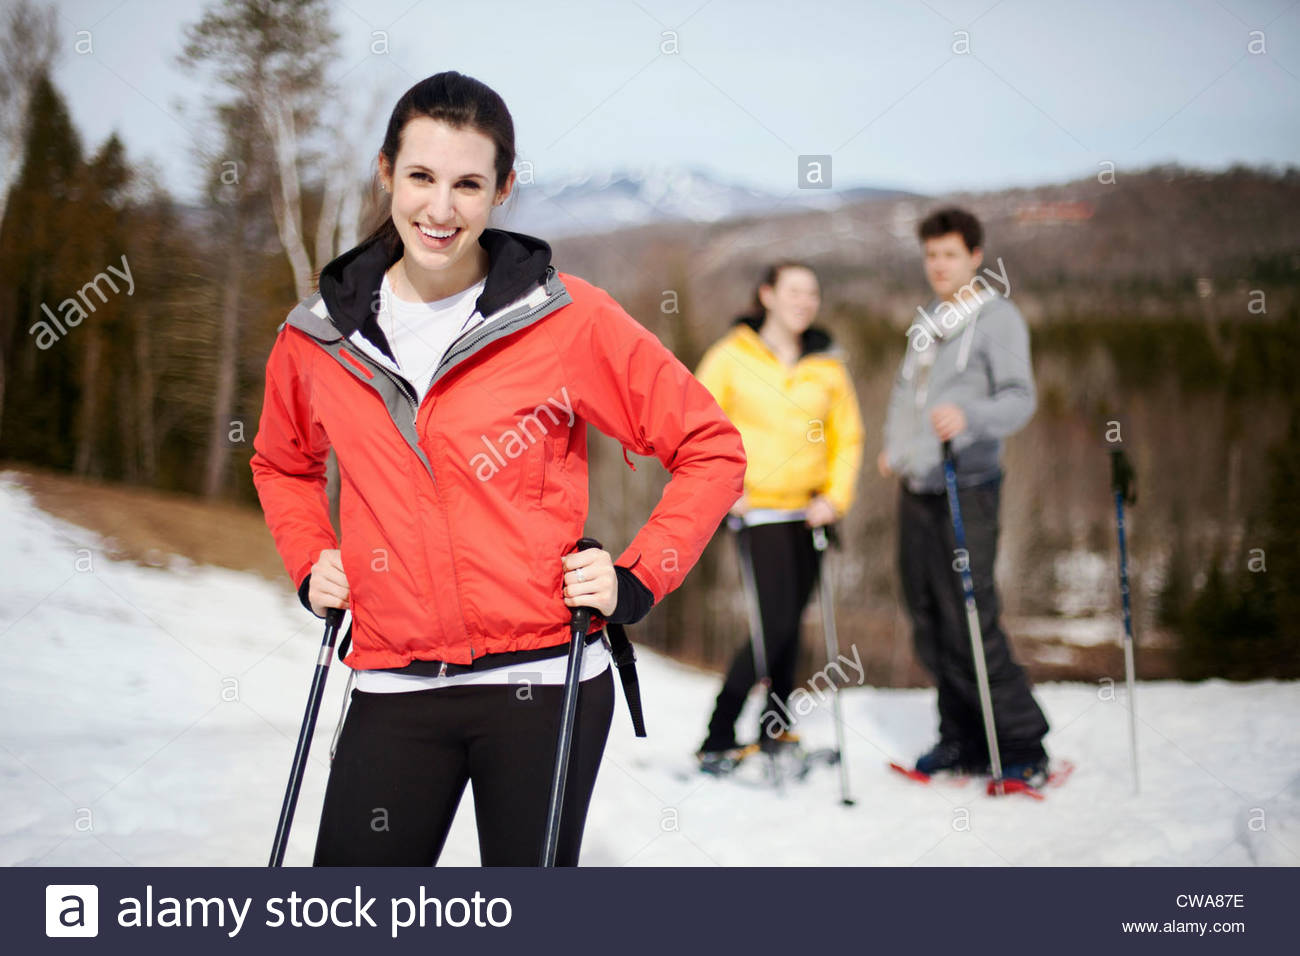 Young woman with ski poles - Stock Image